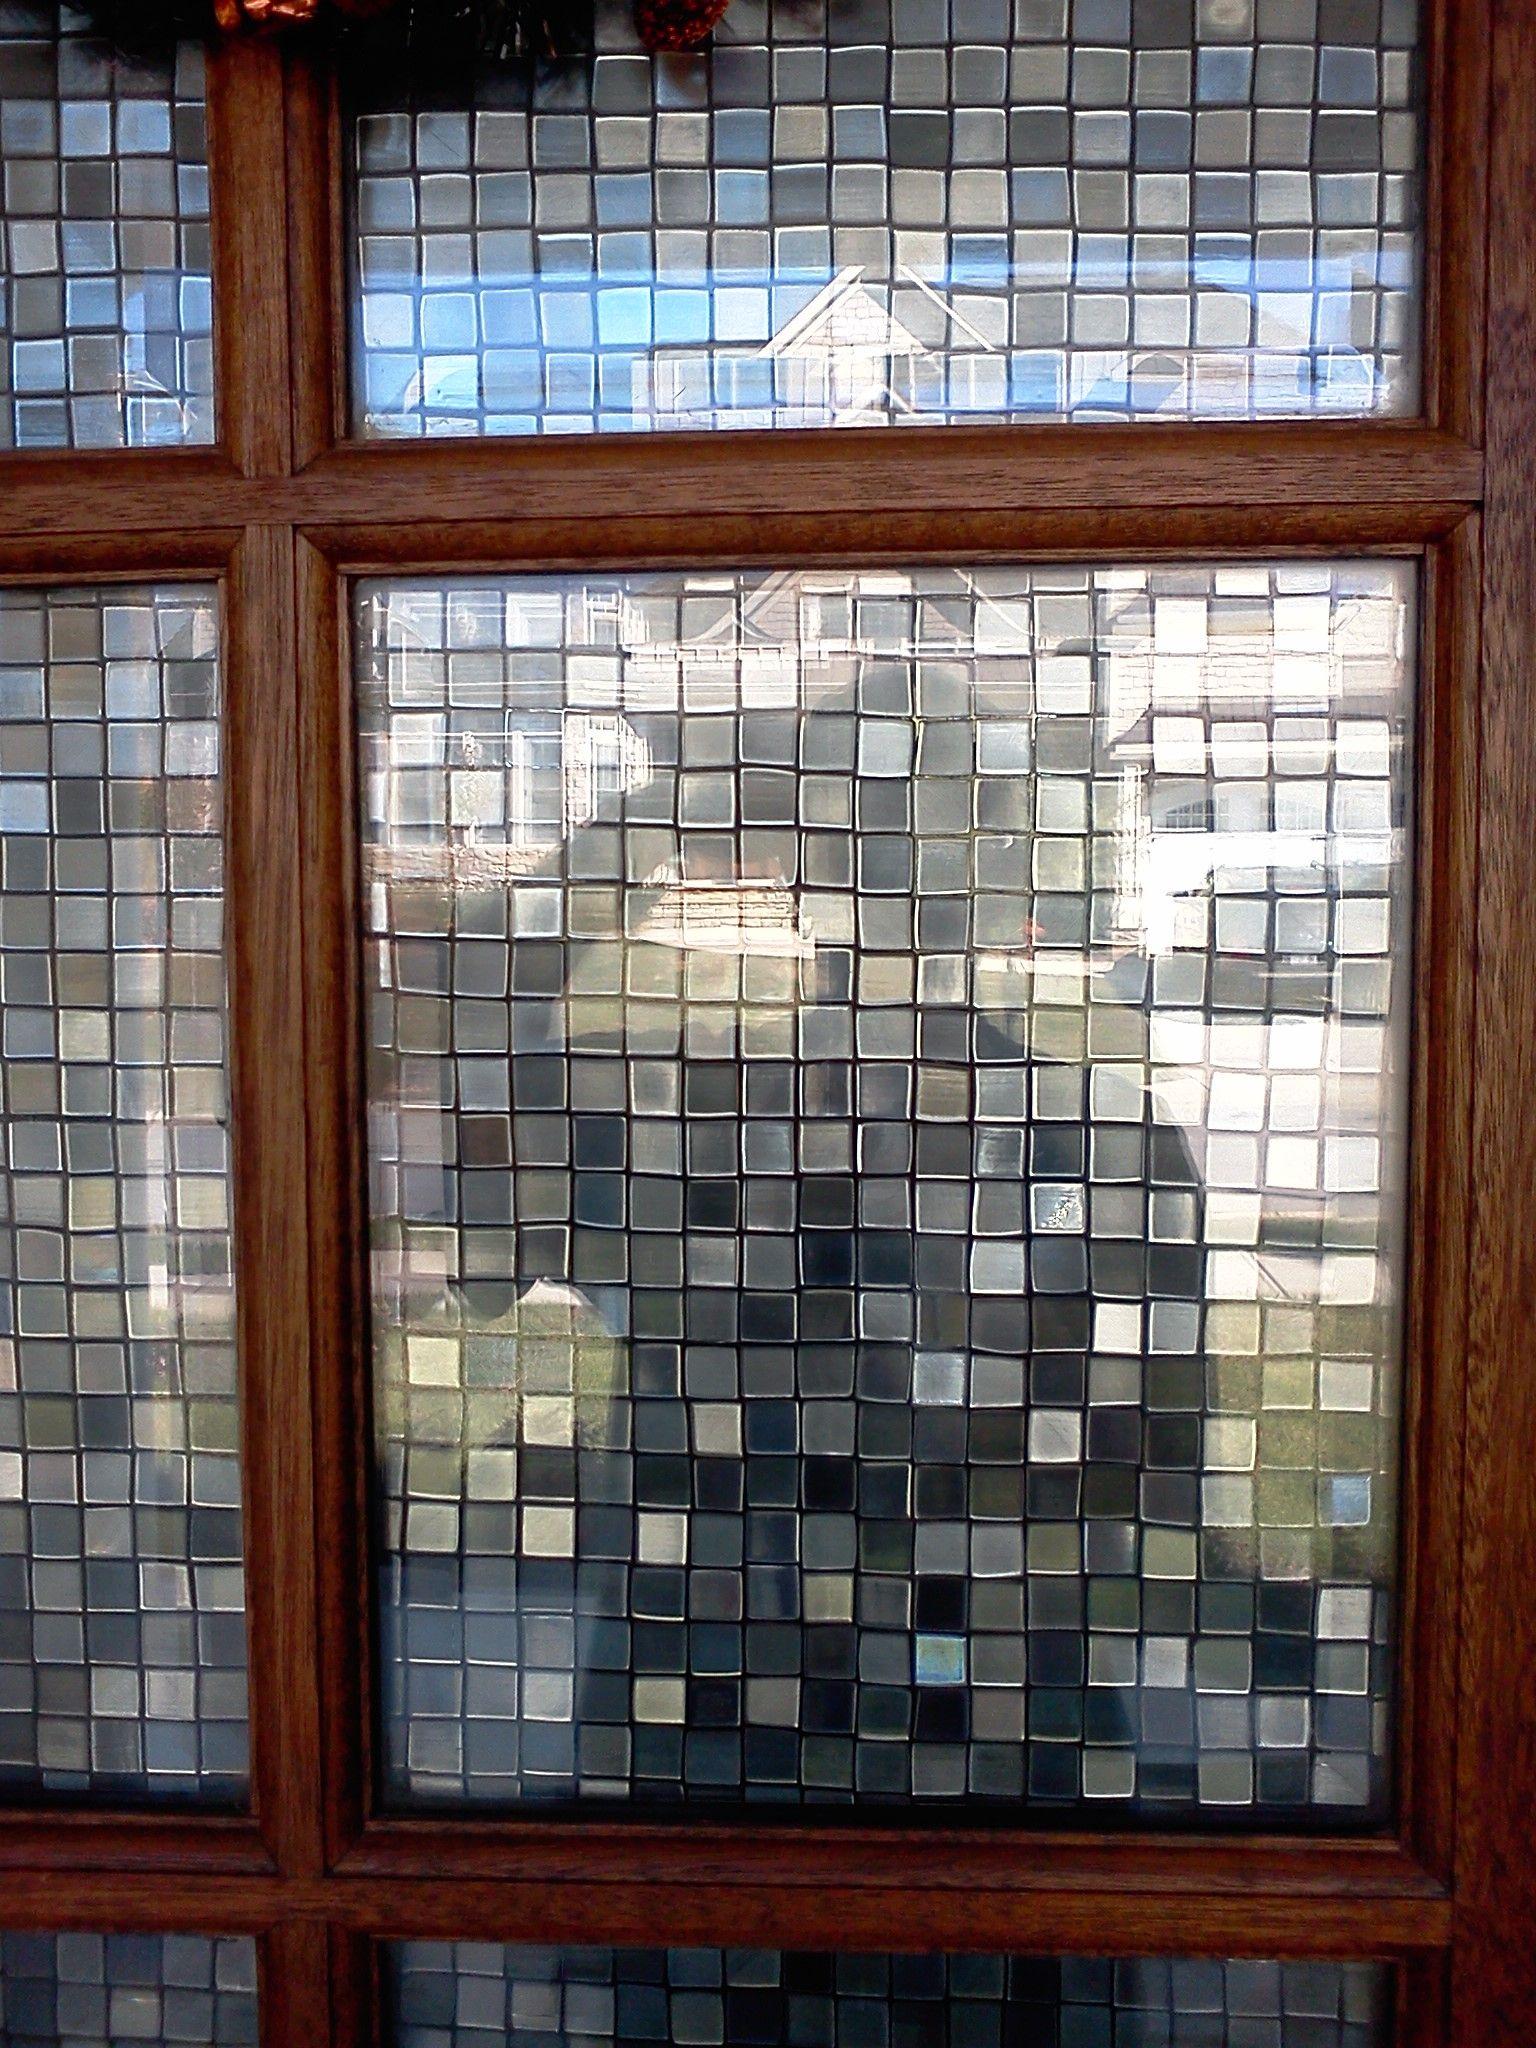 Cut Glass Mosaic Window Film Mosaic Windows Pinterest Window Film Cut Glass And Mosaics